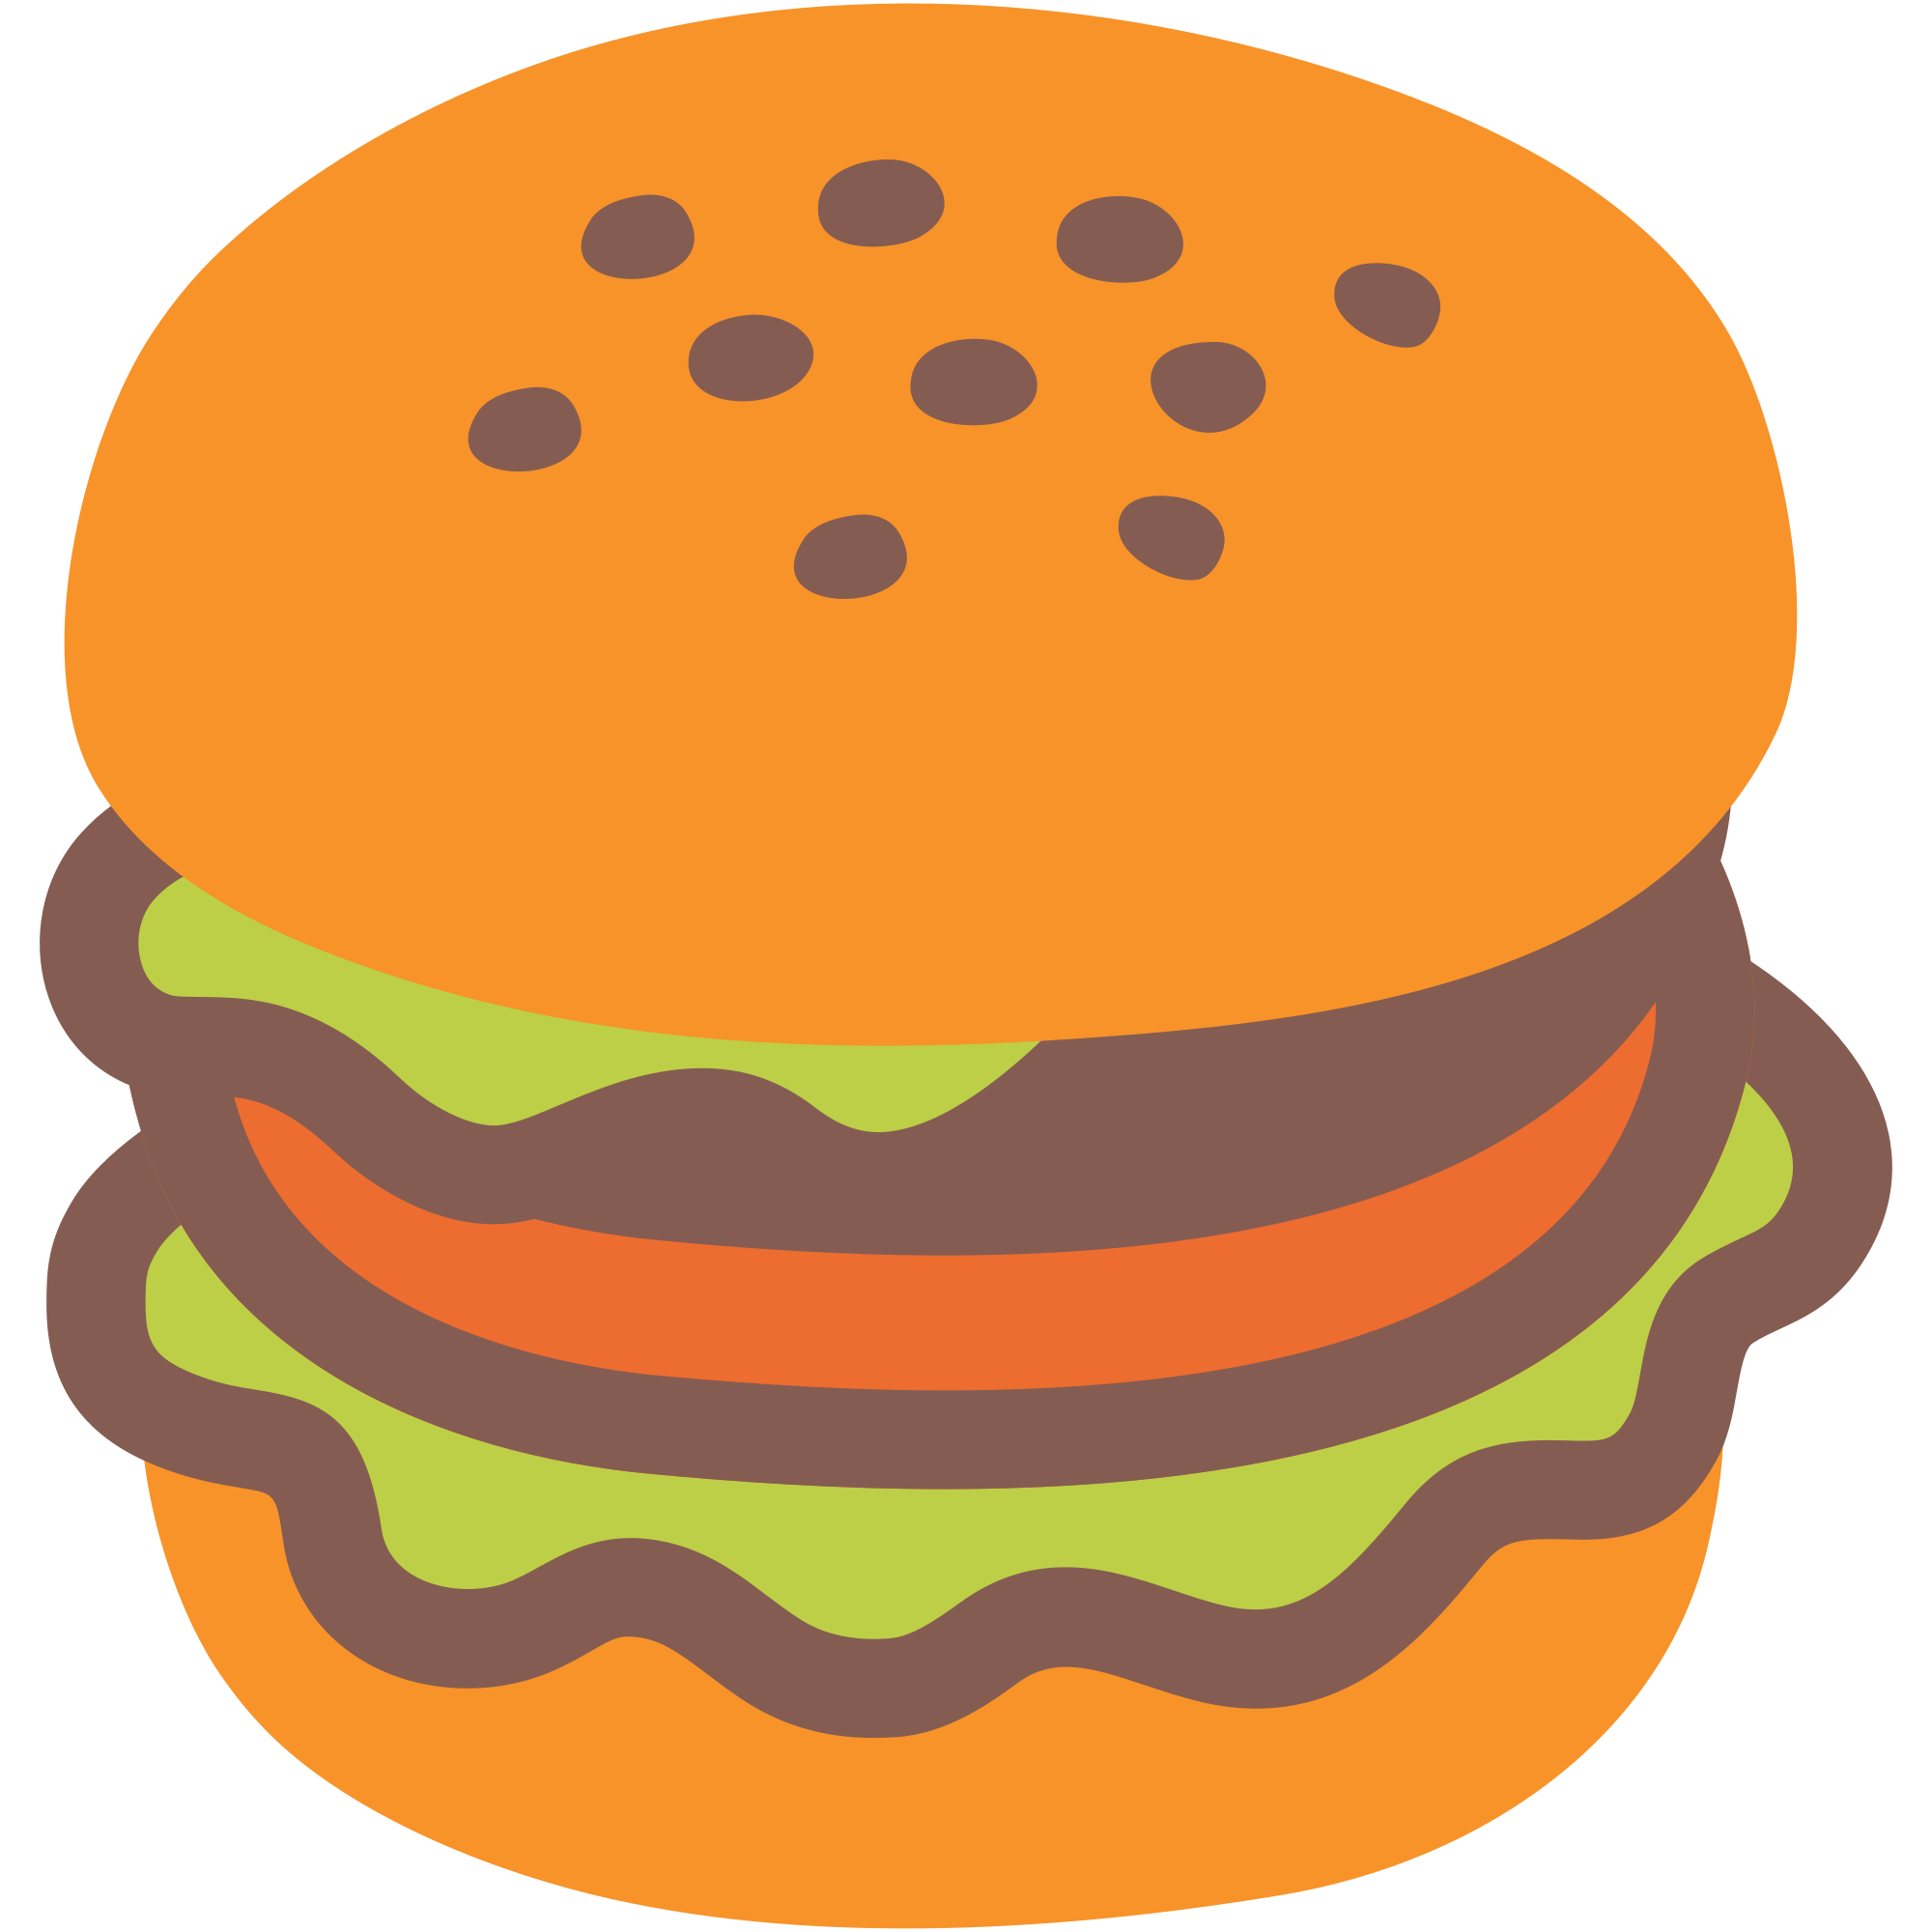 Burger clipart emoji. File u f svg